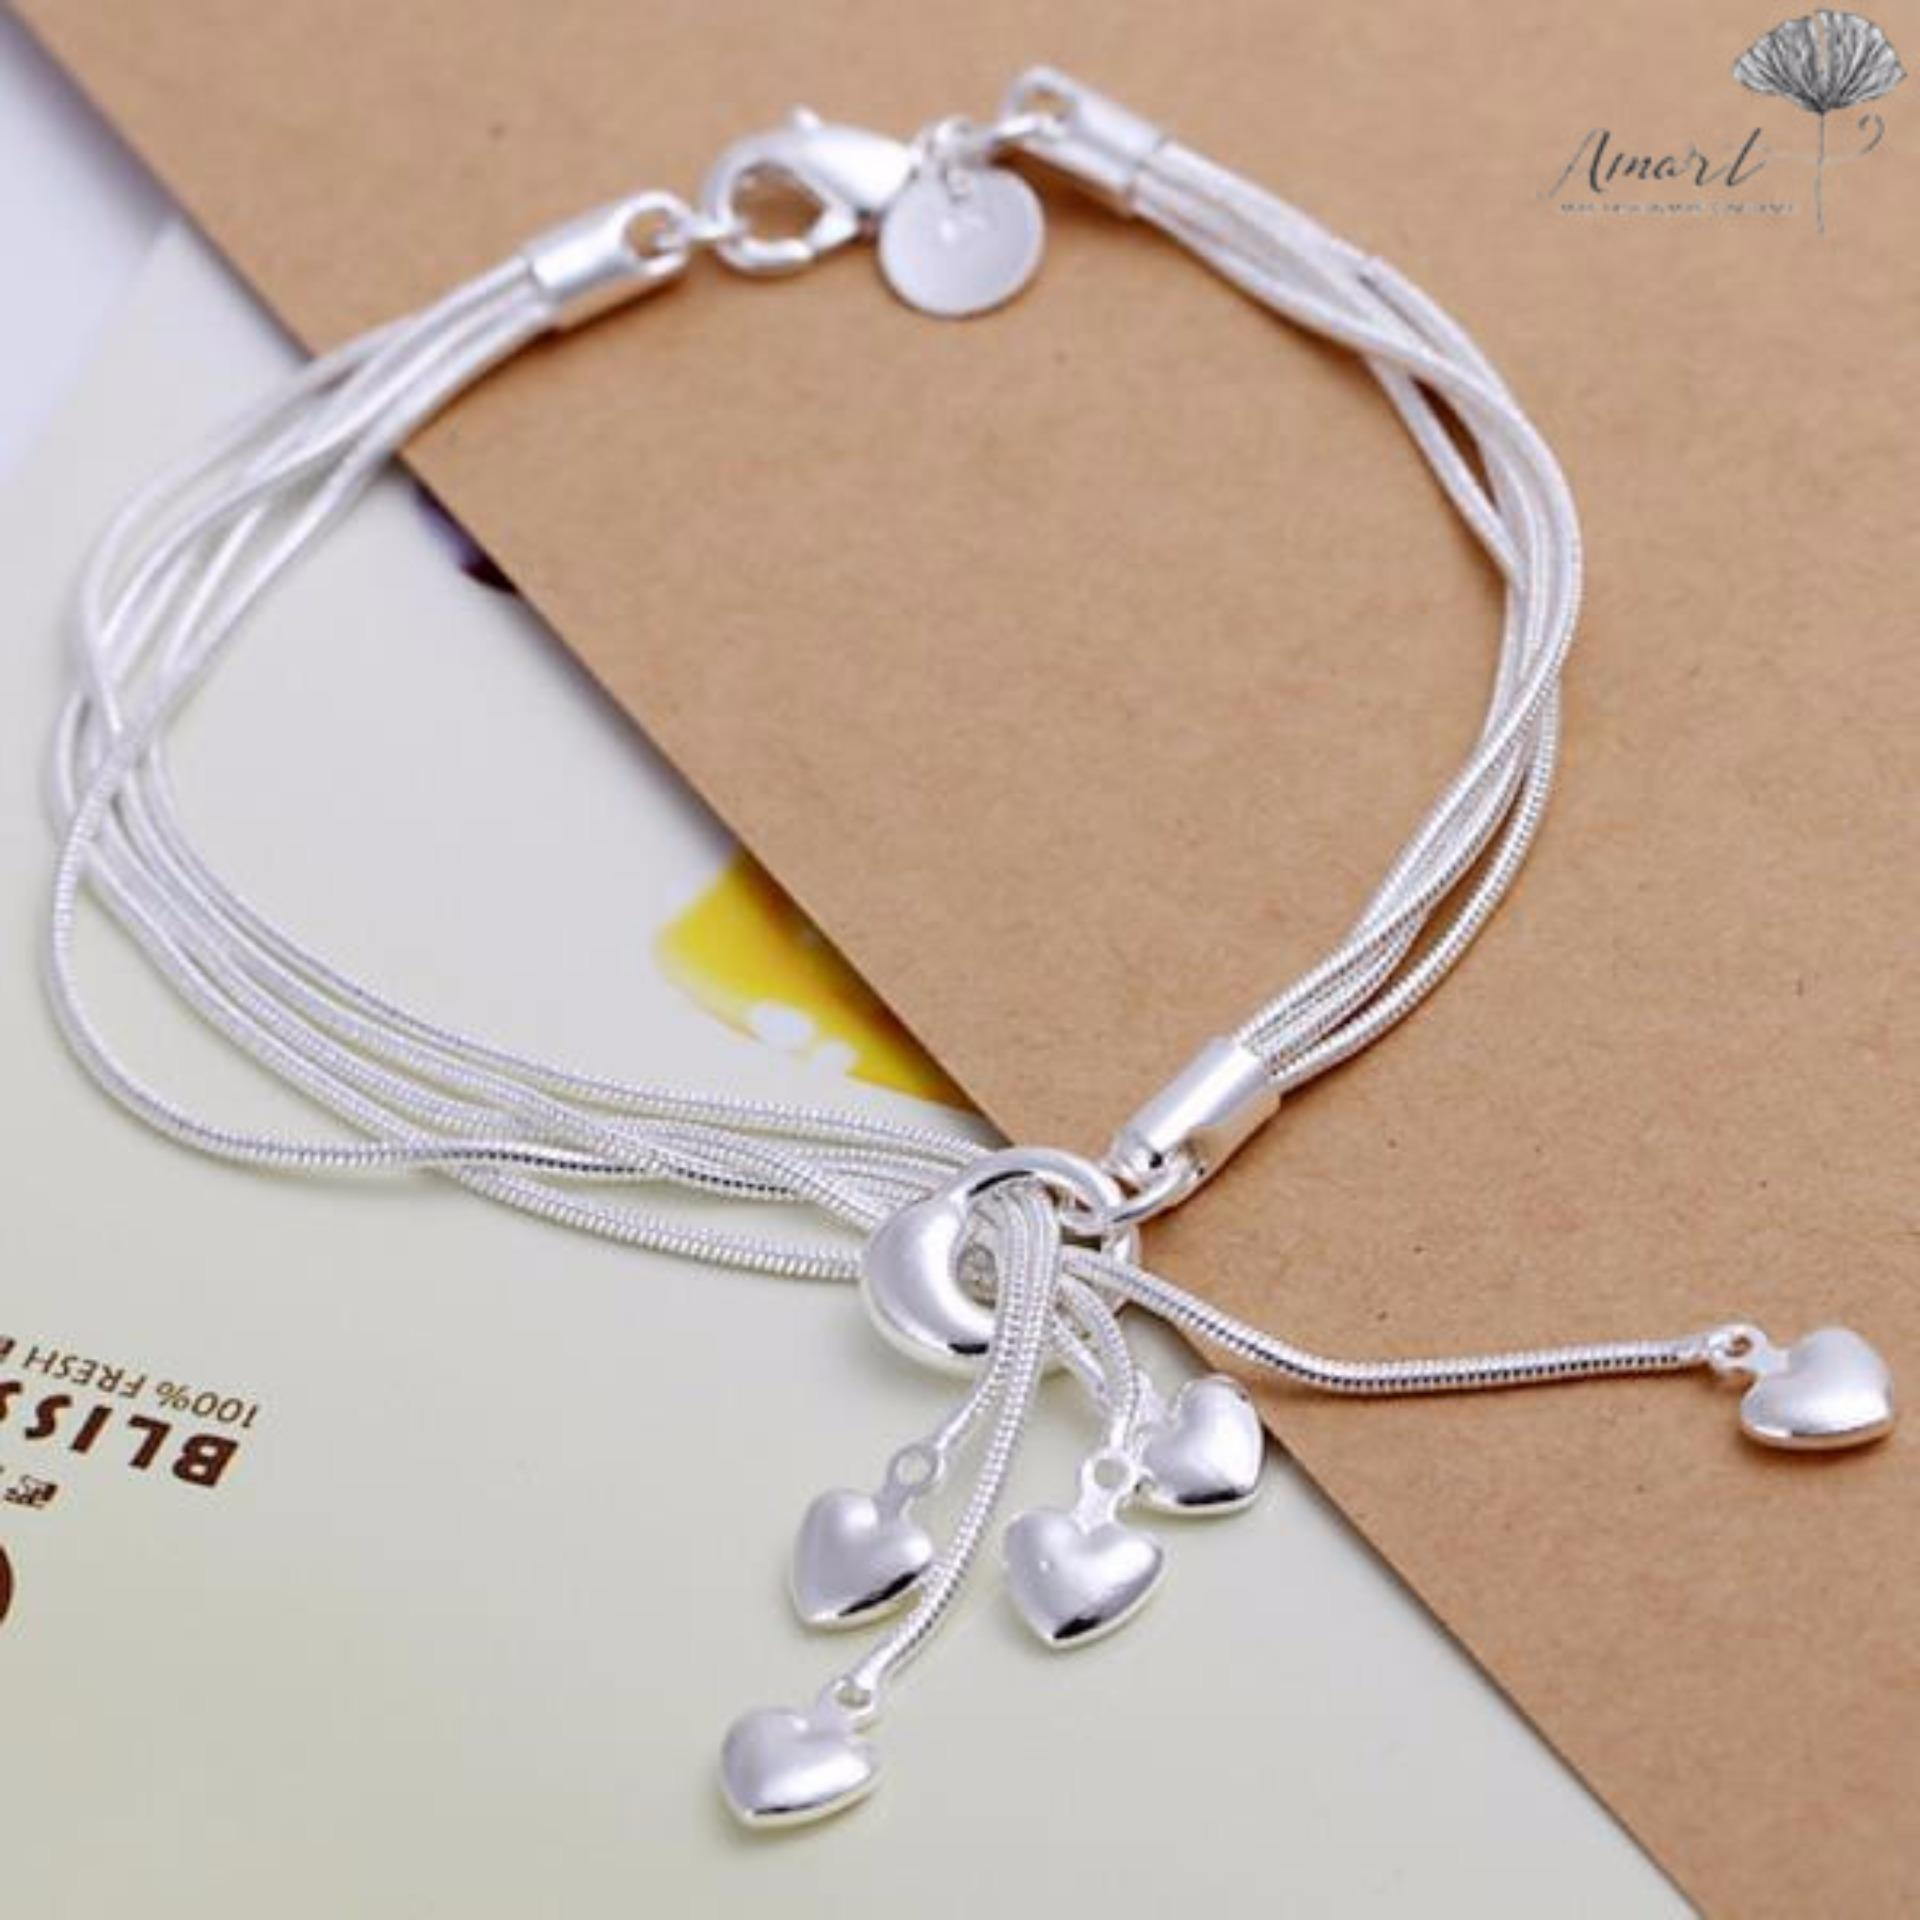 Amart Sterling Silver Charm TaiJi 5 Heart Pendant Chain Bracelet (Silver) - Intl